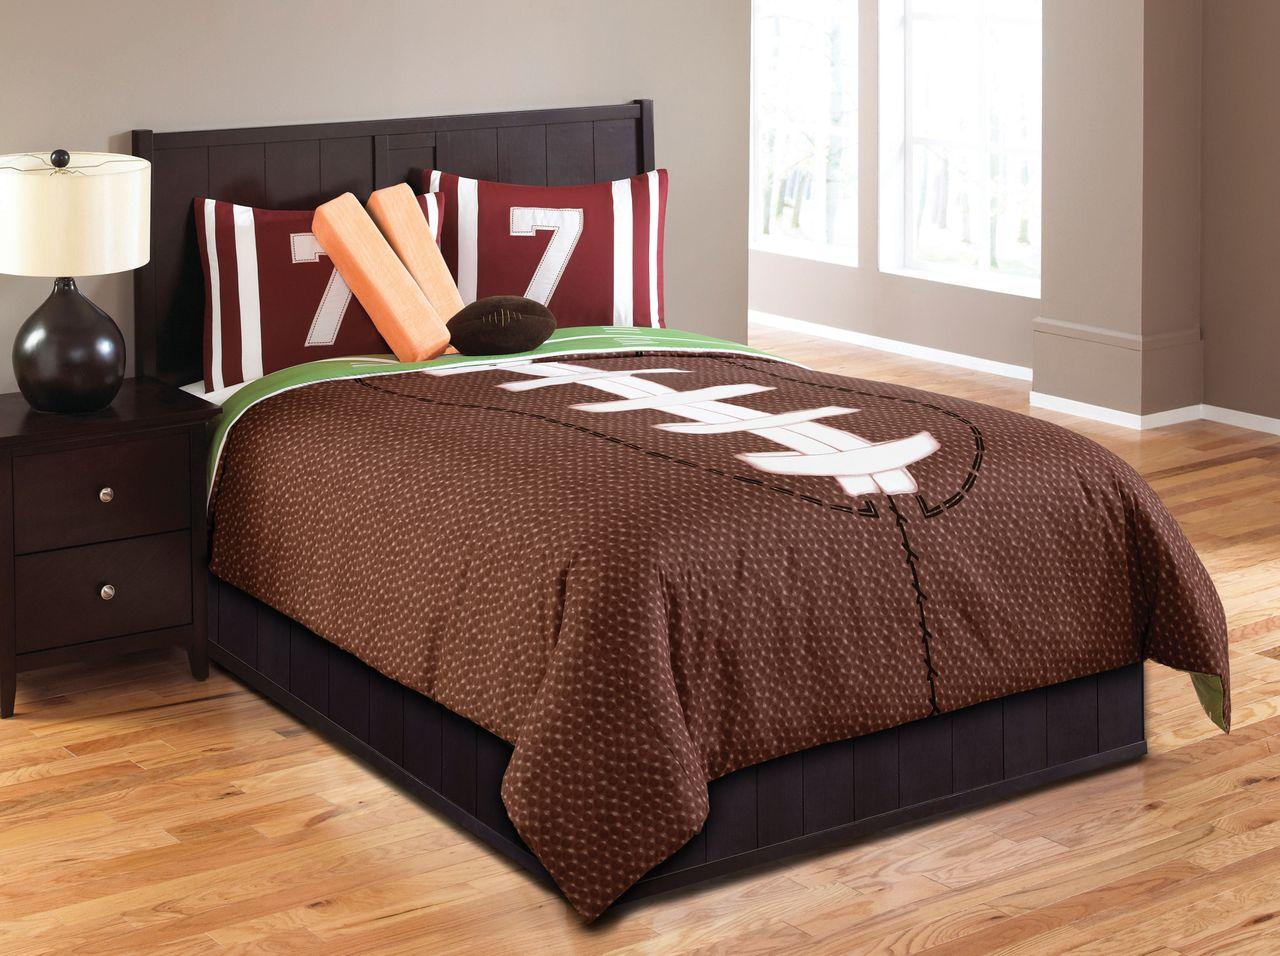 Boys sports bedding sets full - Hallmart Touchdown Comforter Set Hallmart Kids Soccer